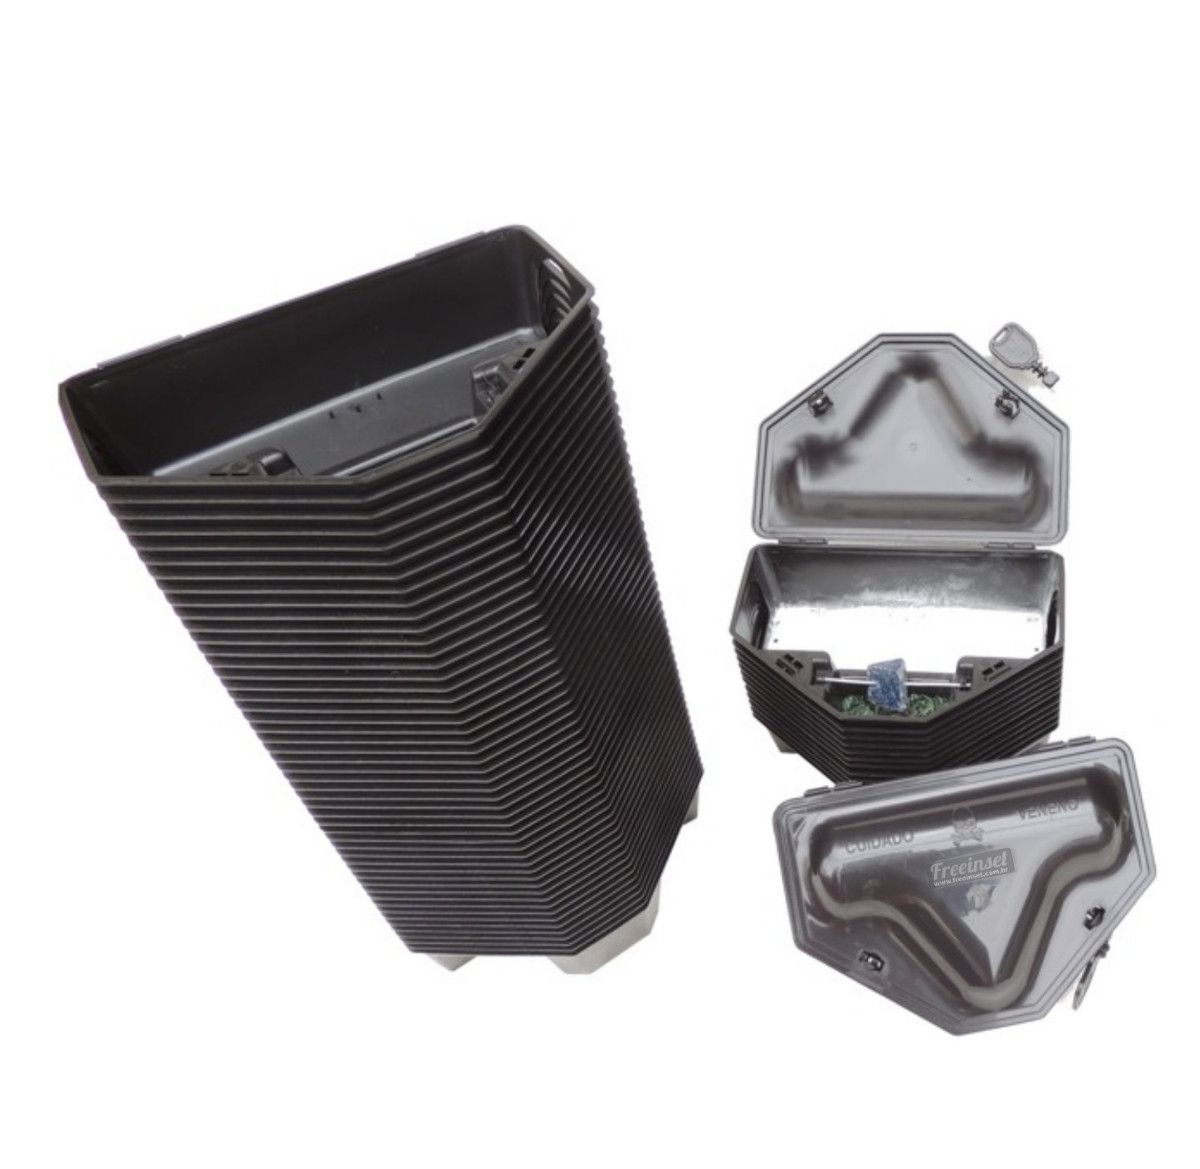 Kit 73 Porta Isca Com 2 Chaves - Duplo Travamento